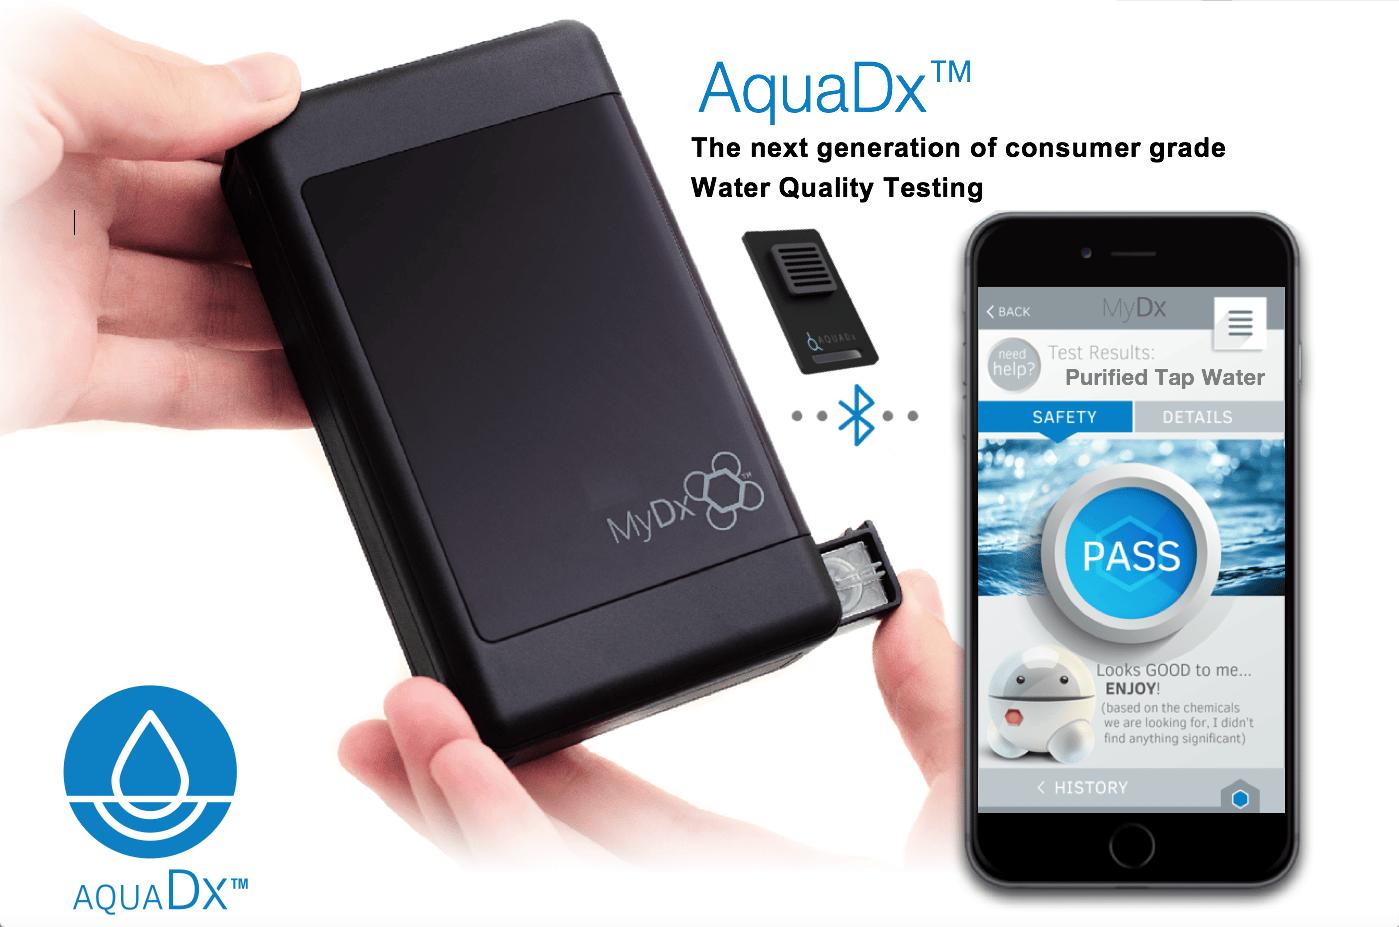 The AquaDx system